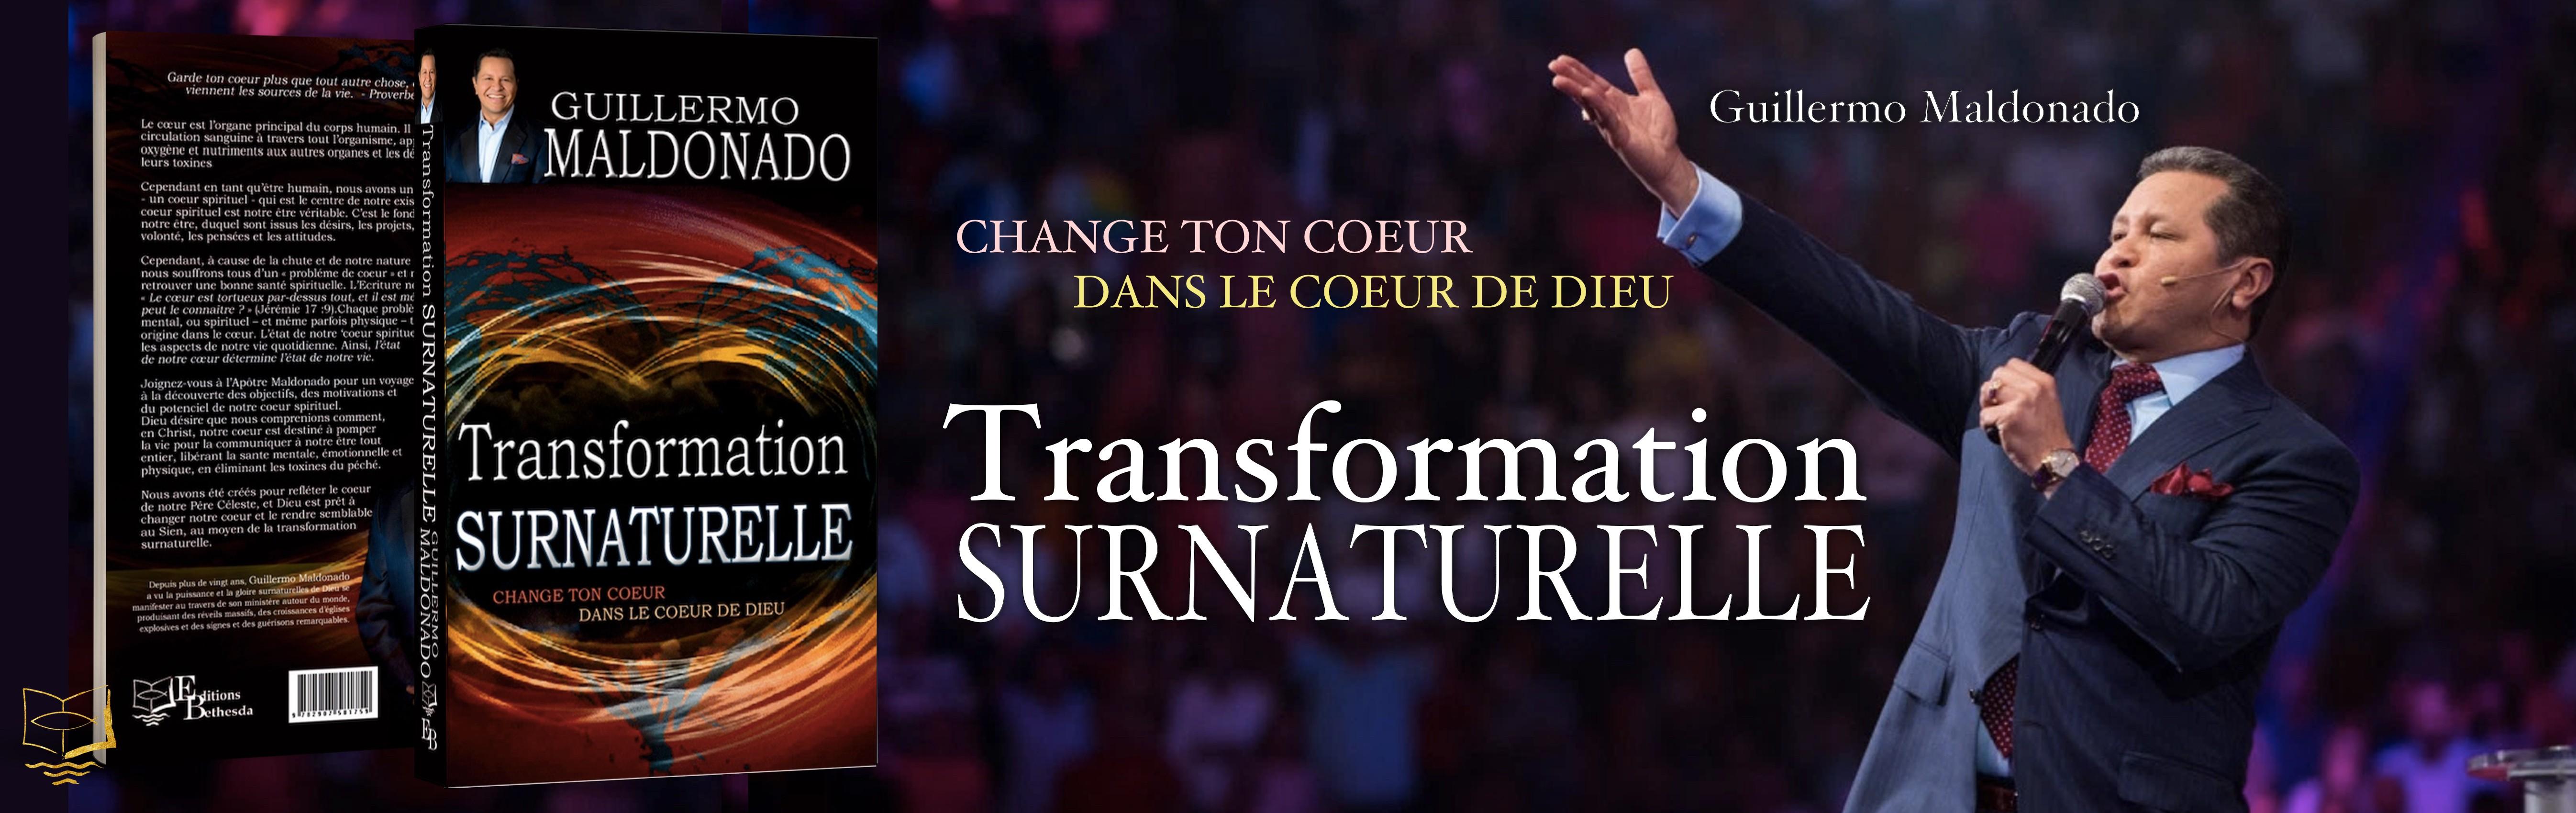 TRANSFORMATION SURNATURELLE - Guillermo MALDONADO